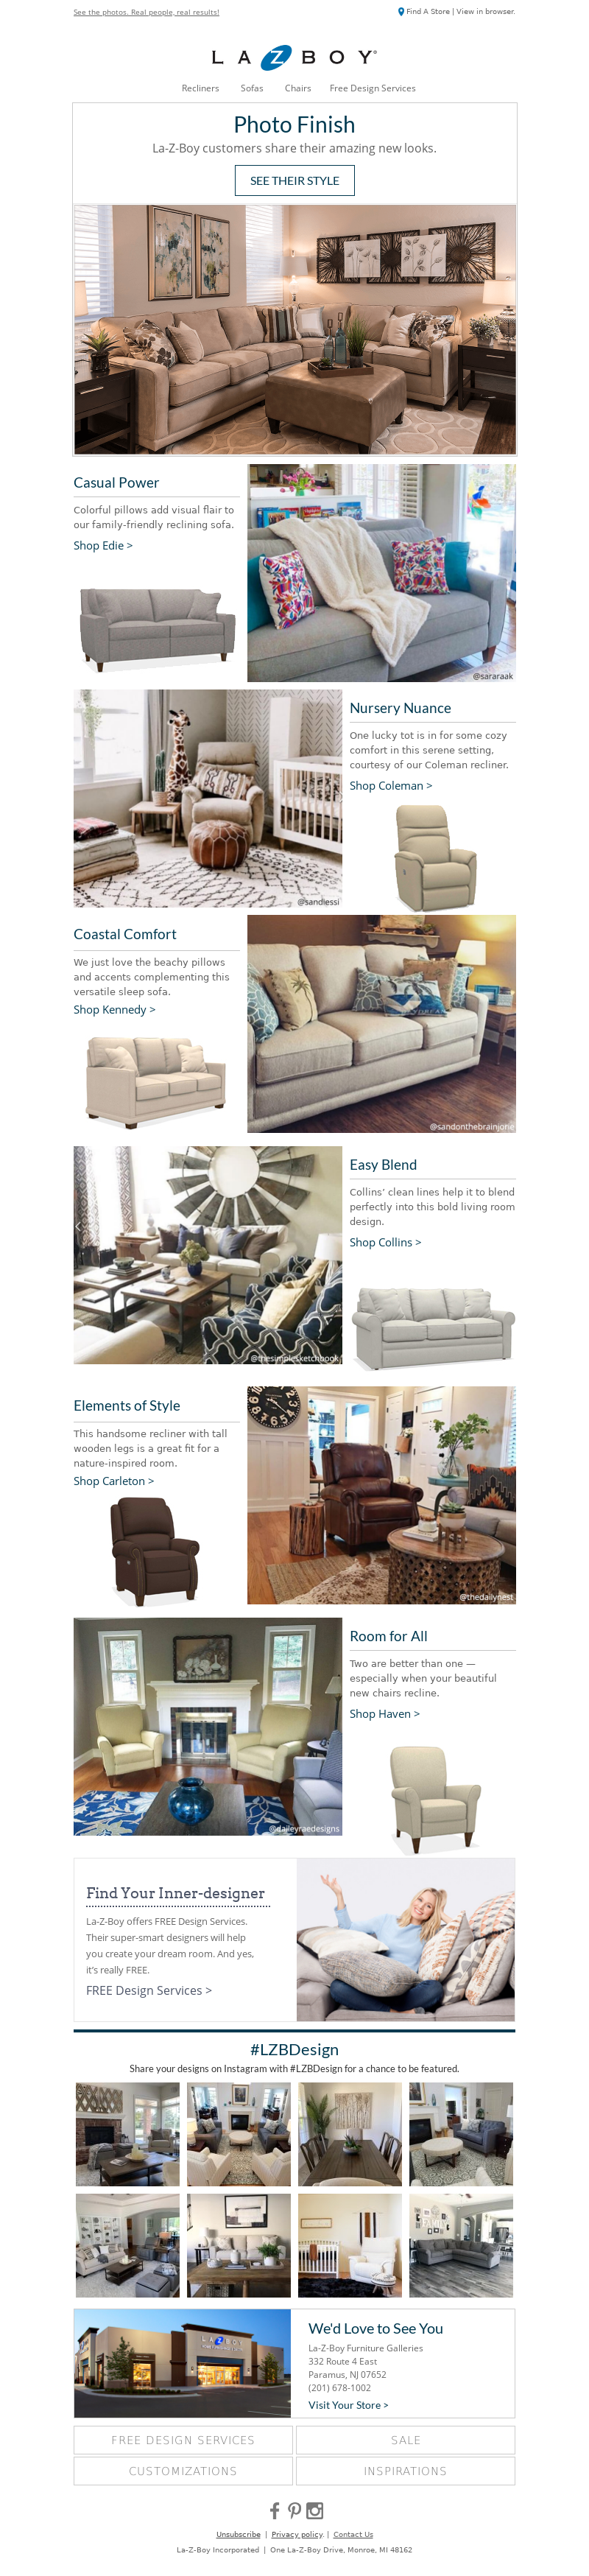 La-Z-Boy - Amazing! See 7 Customer Room Reveals.